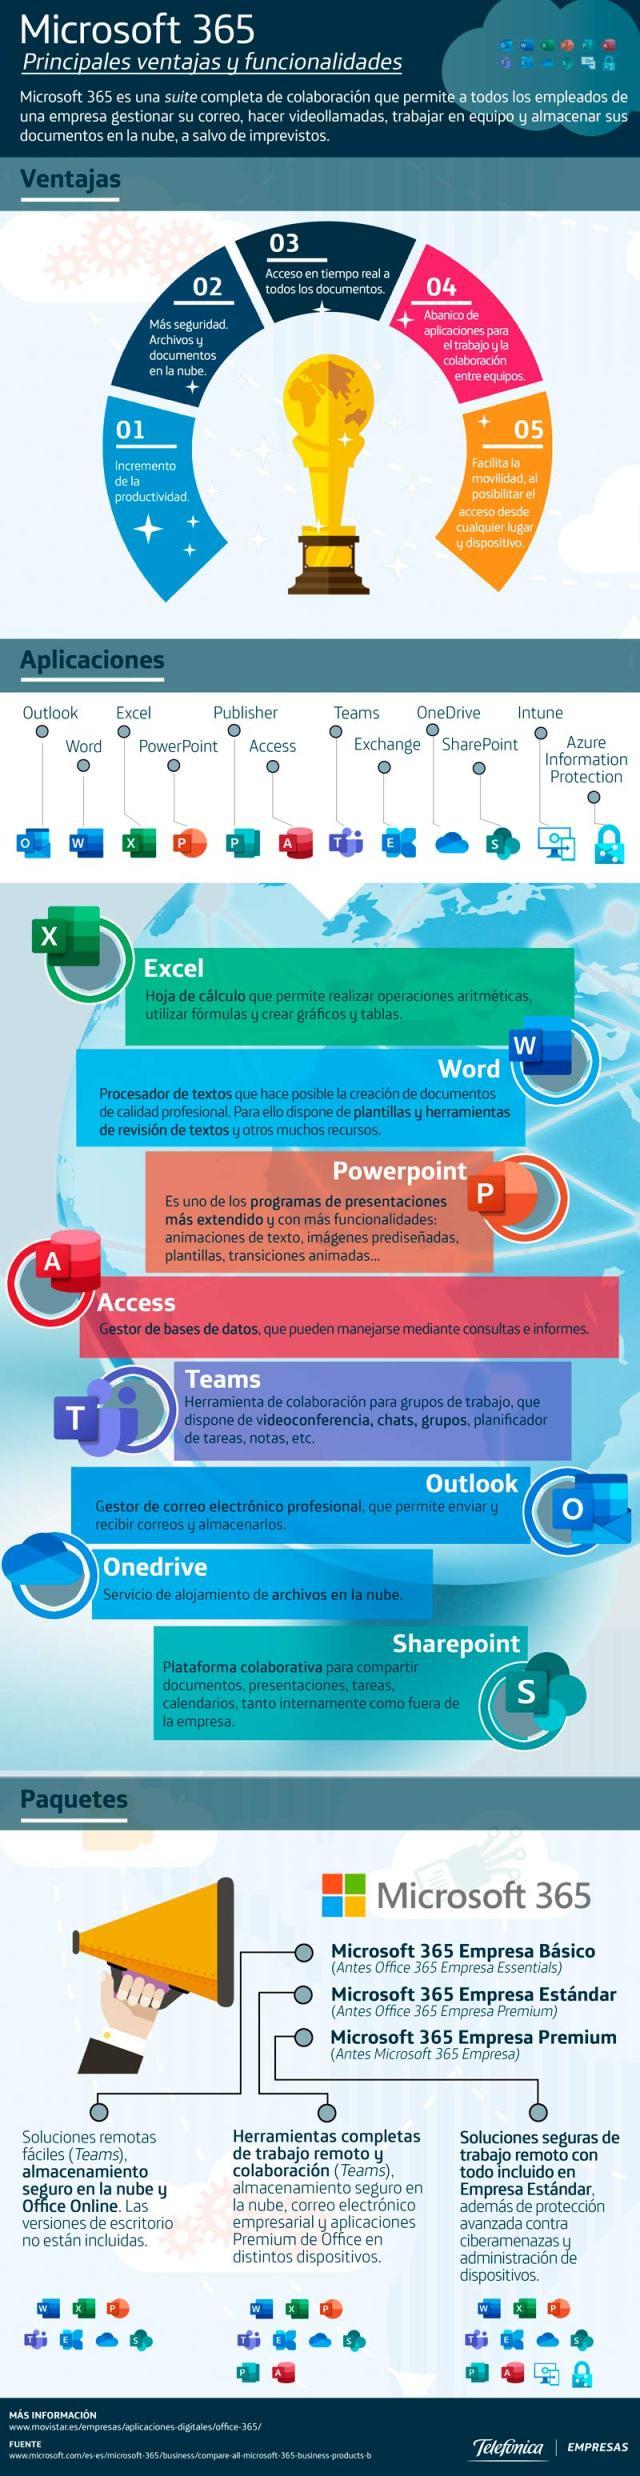 Todo lo que debes saber sobre Microsoft 365